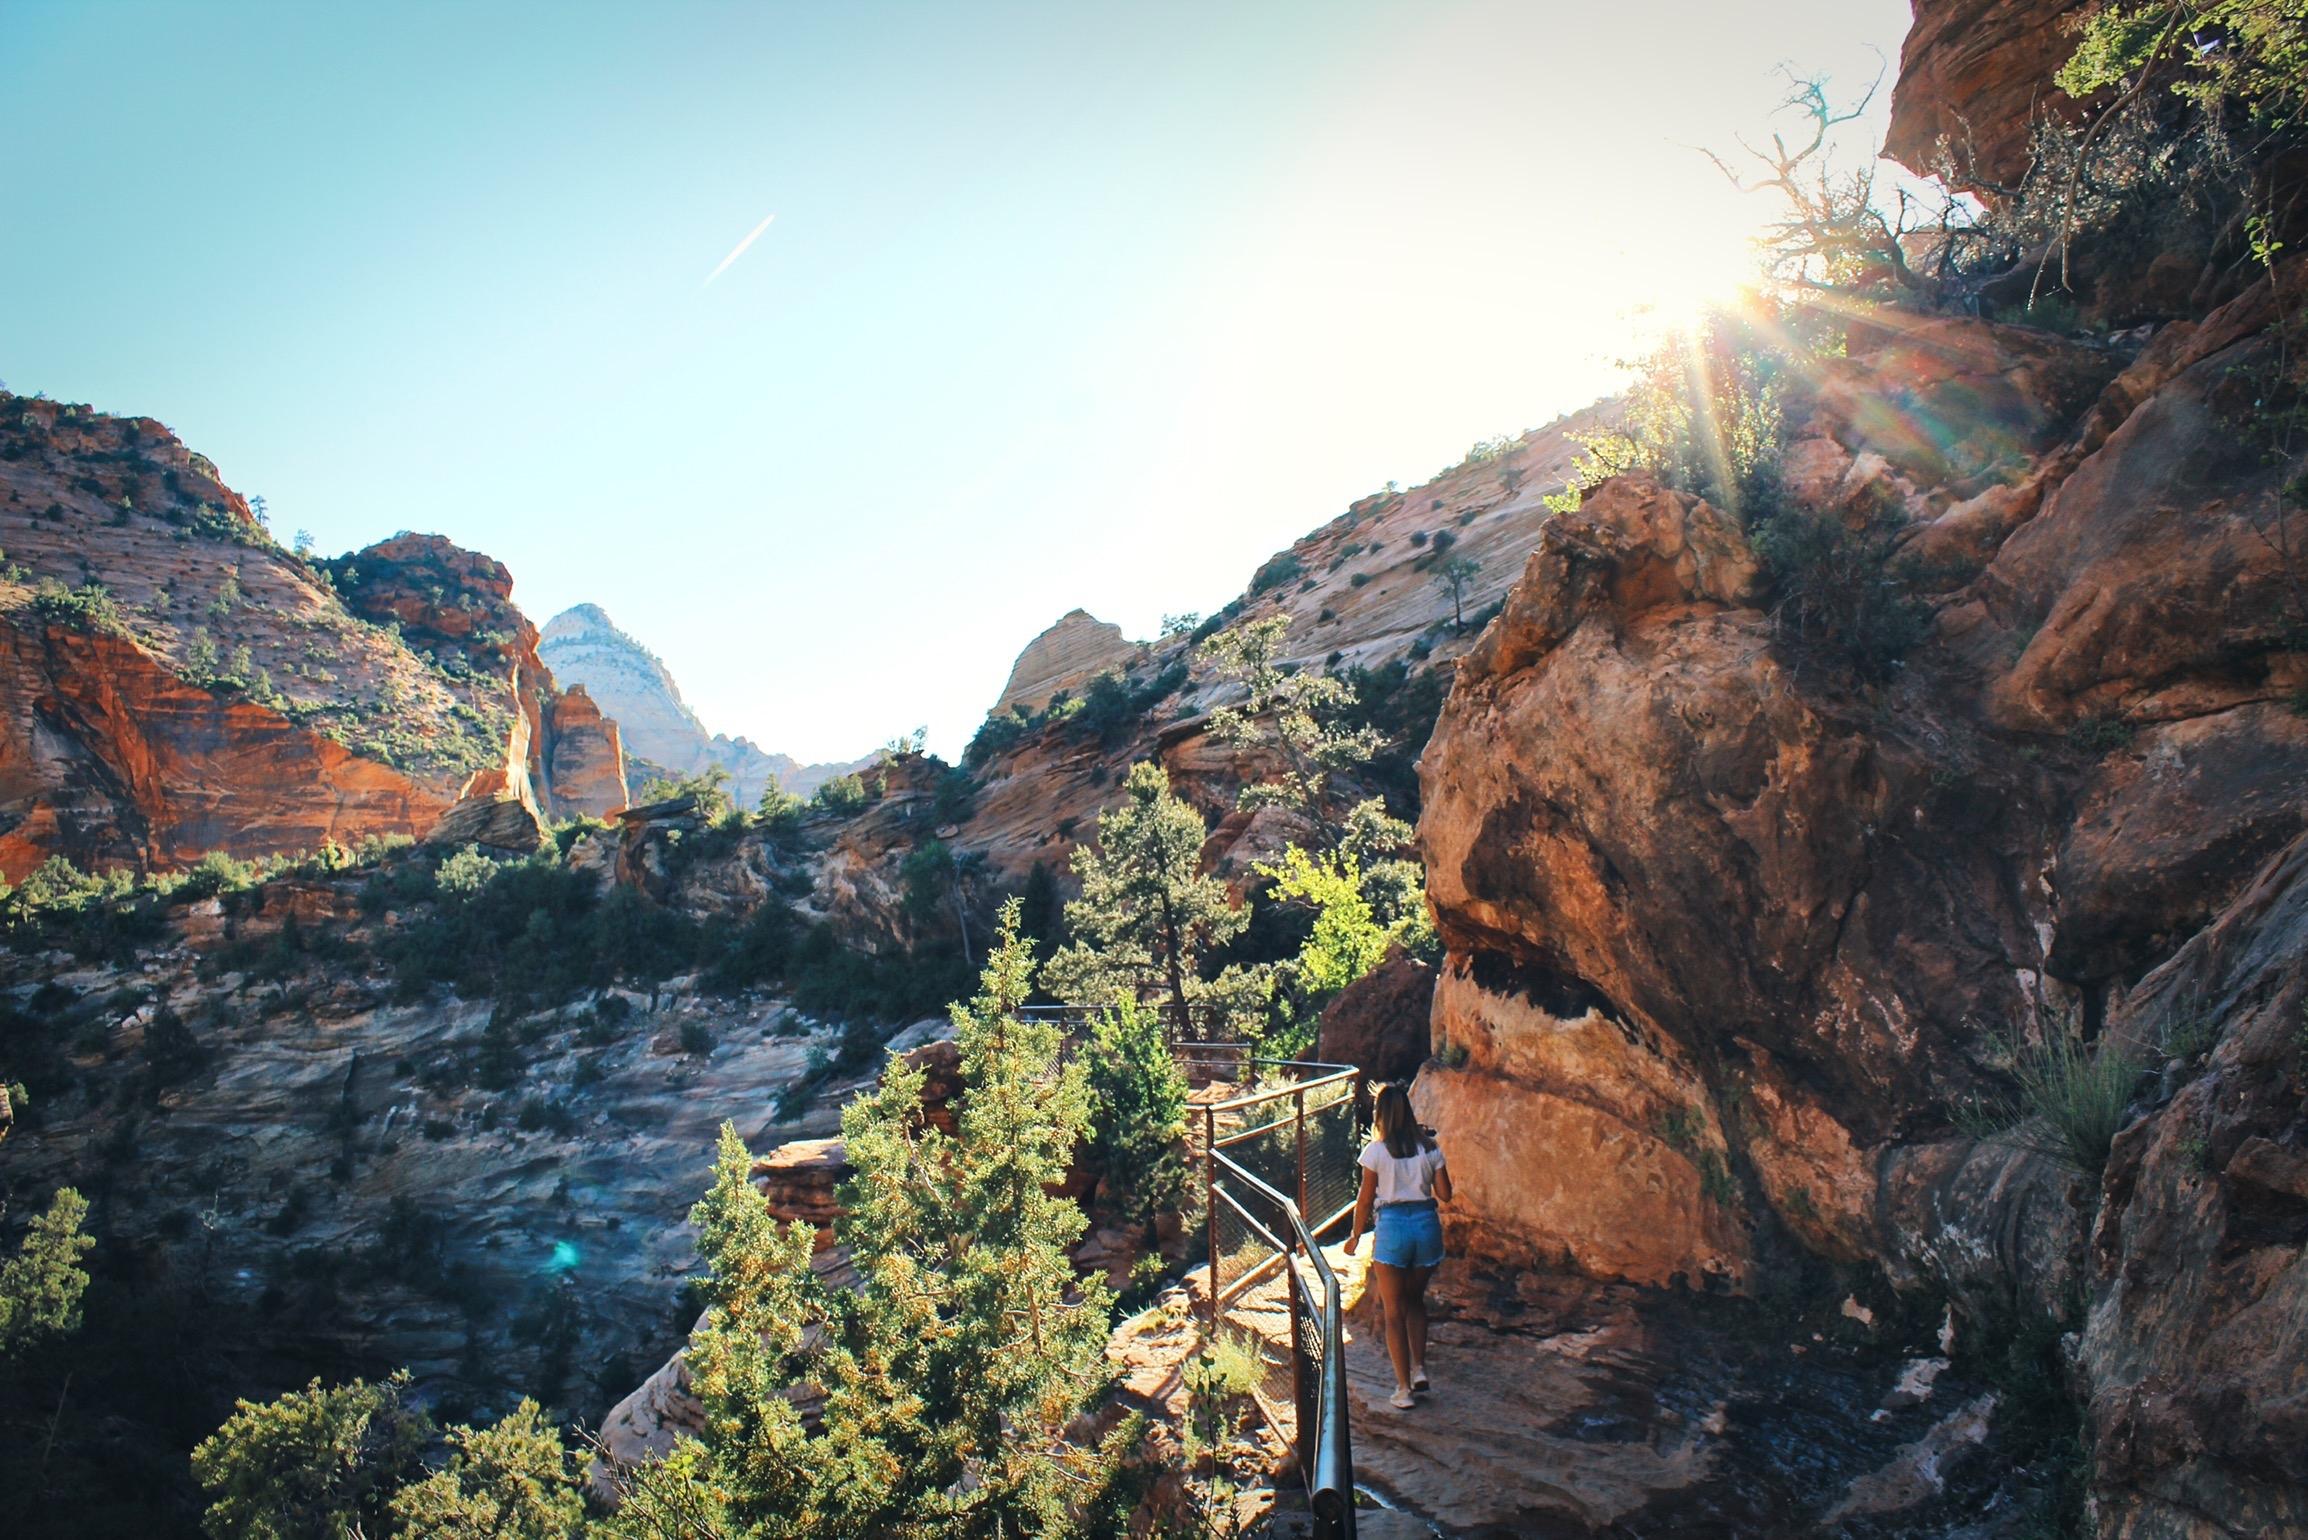 Wandeling naar Canyon Overlook (Zion NP)